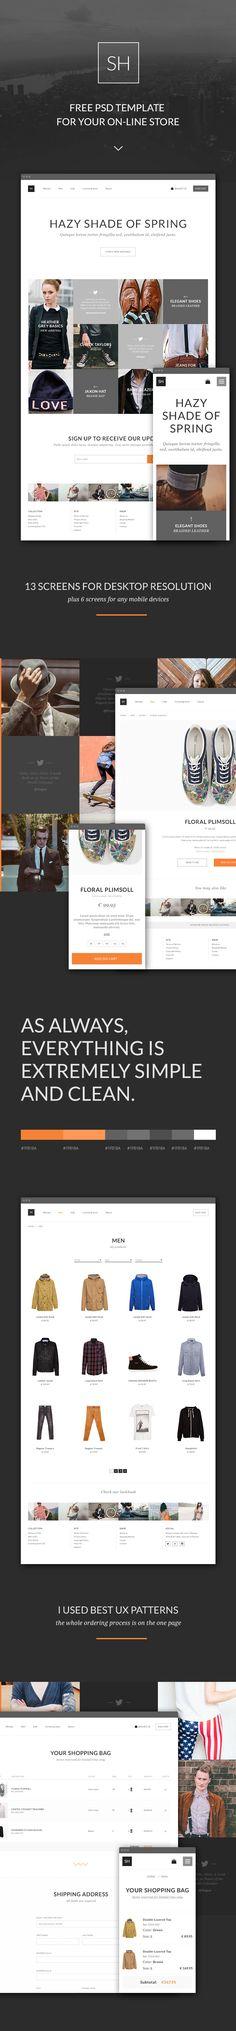 StyleShop WordPress eCommerce Theme Best WordPress Themes